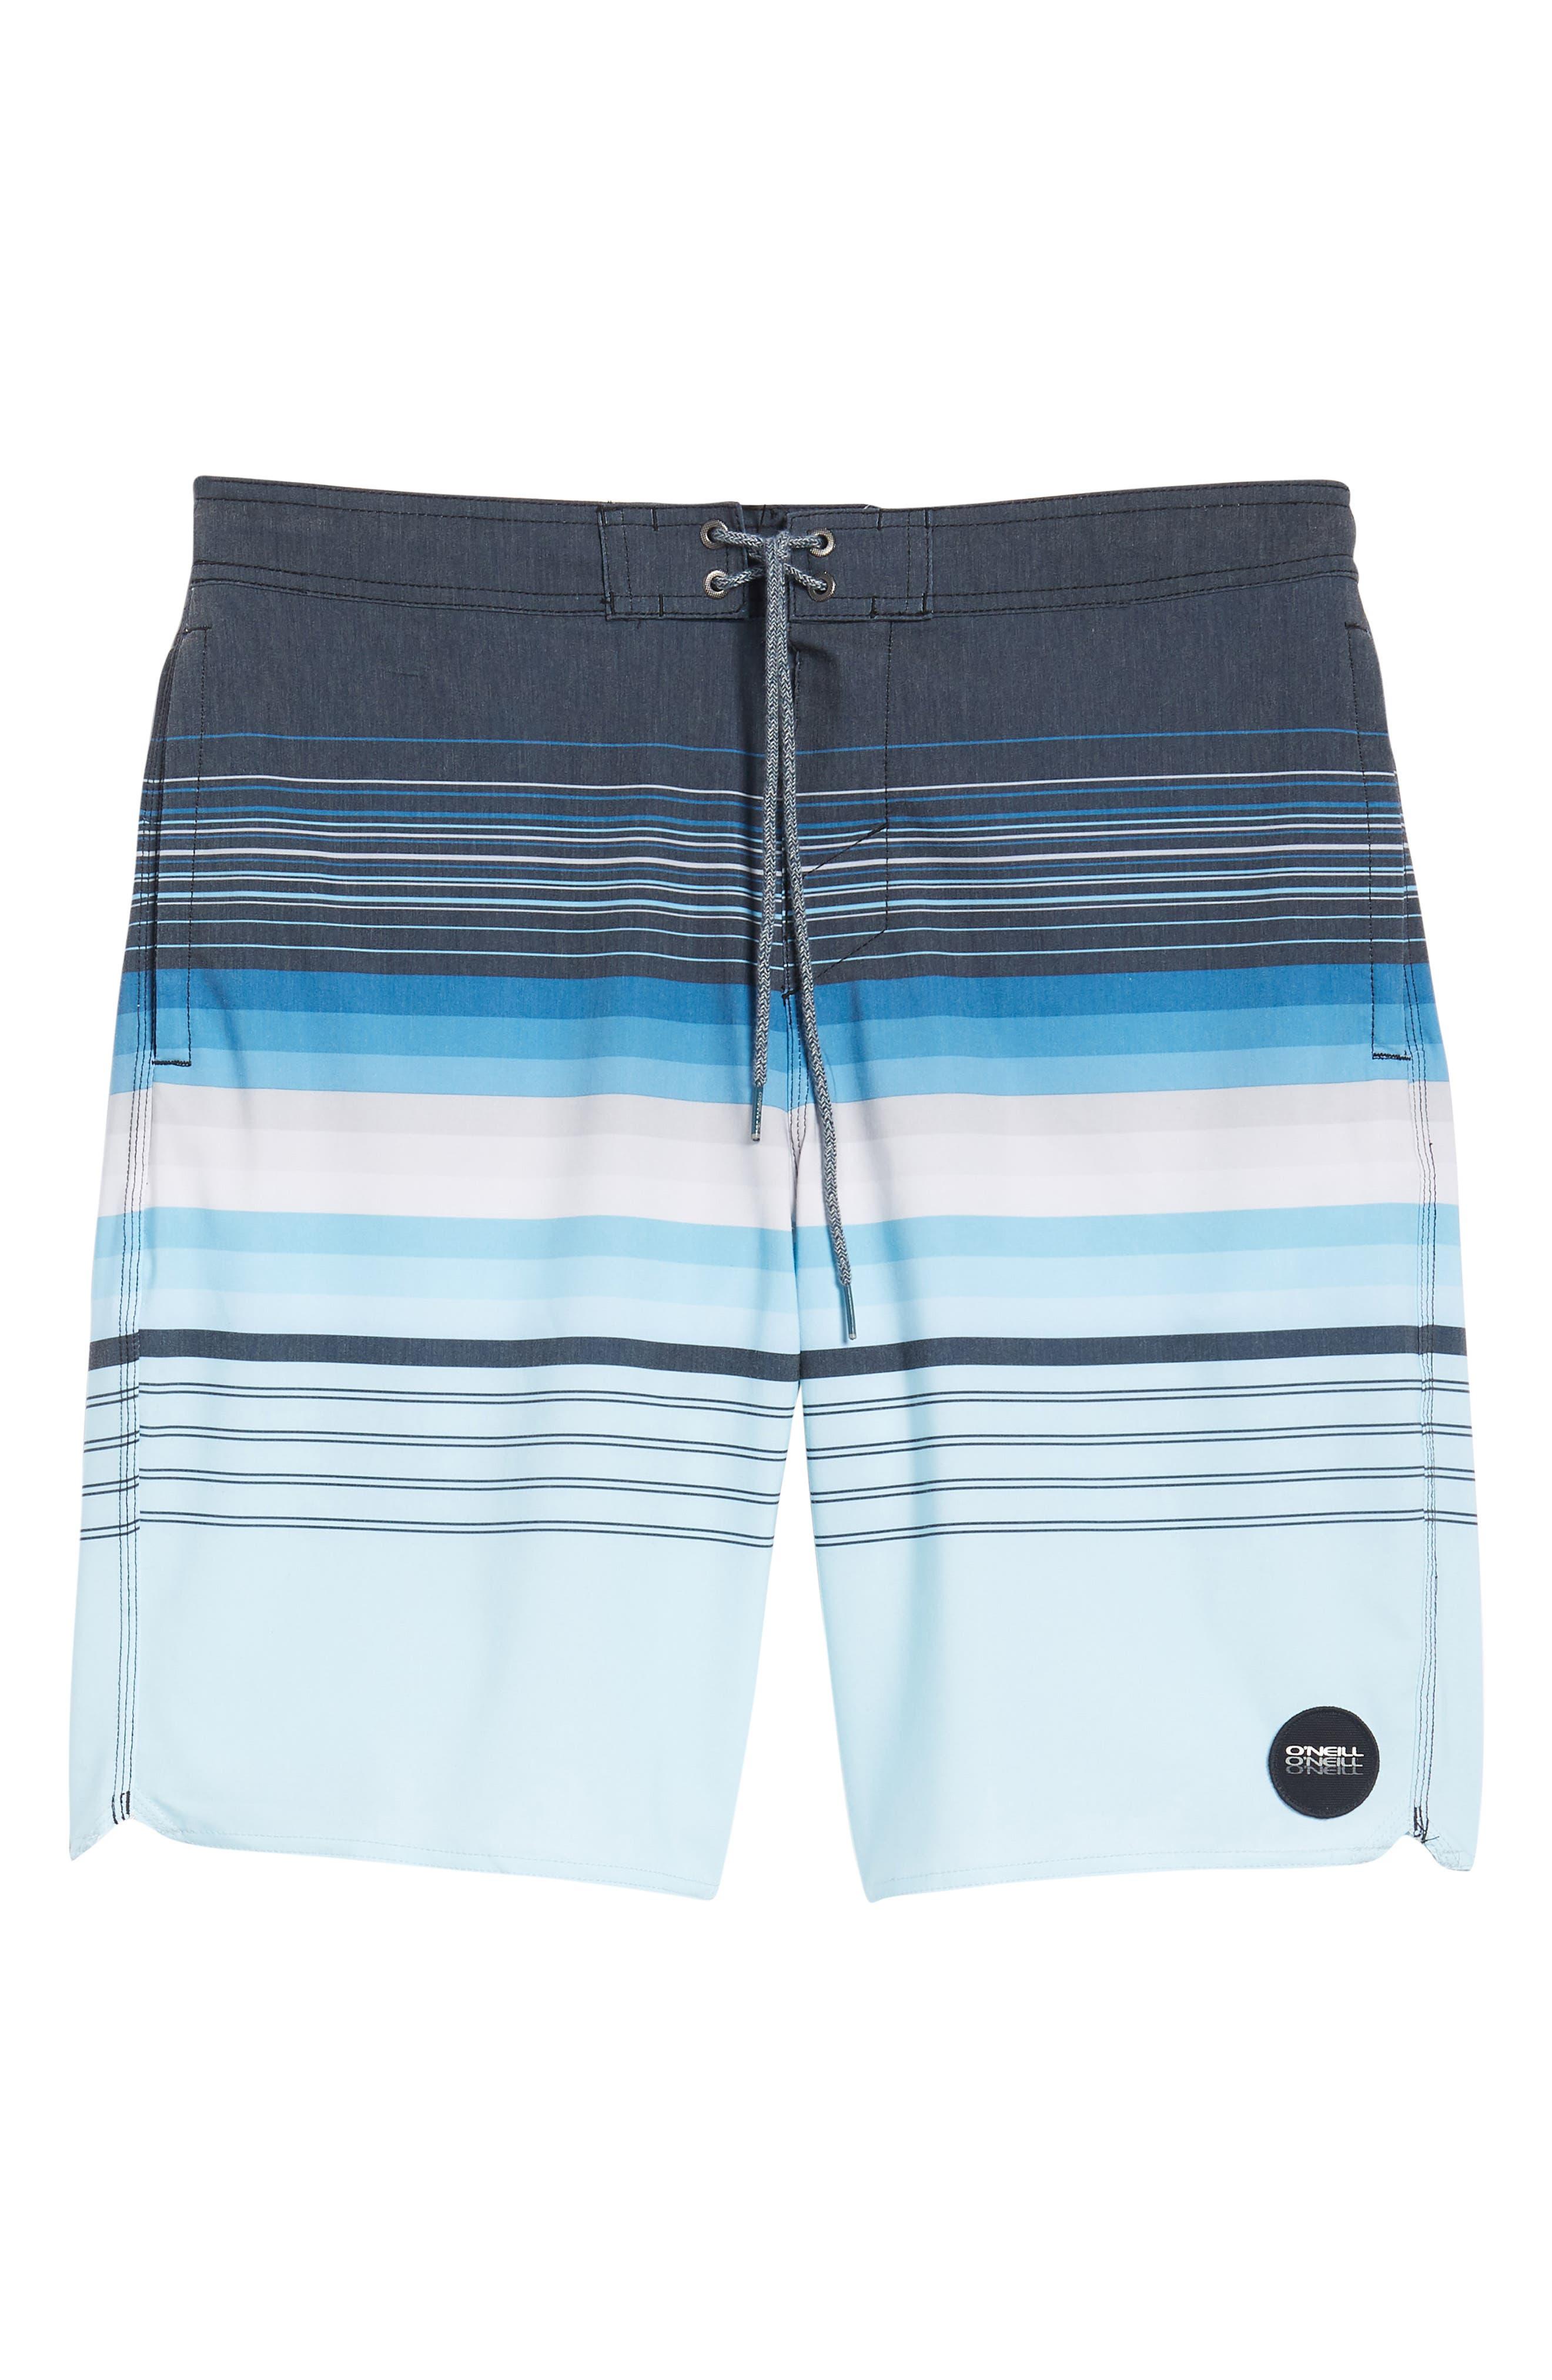 Sandbar Cruzer Board Shorts,                             Alternate thumbnail 6, color,                             NAVY